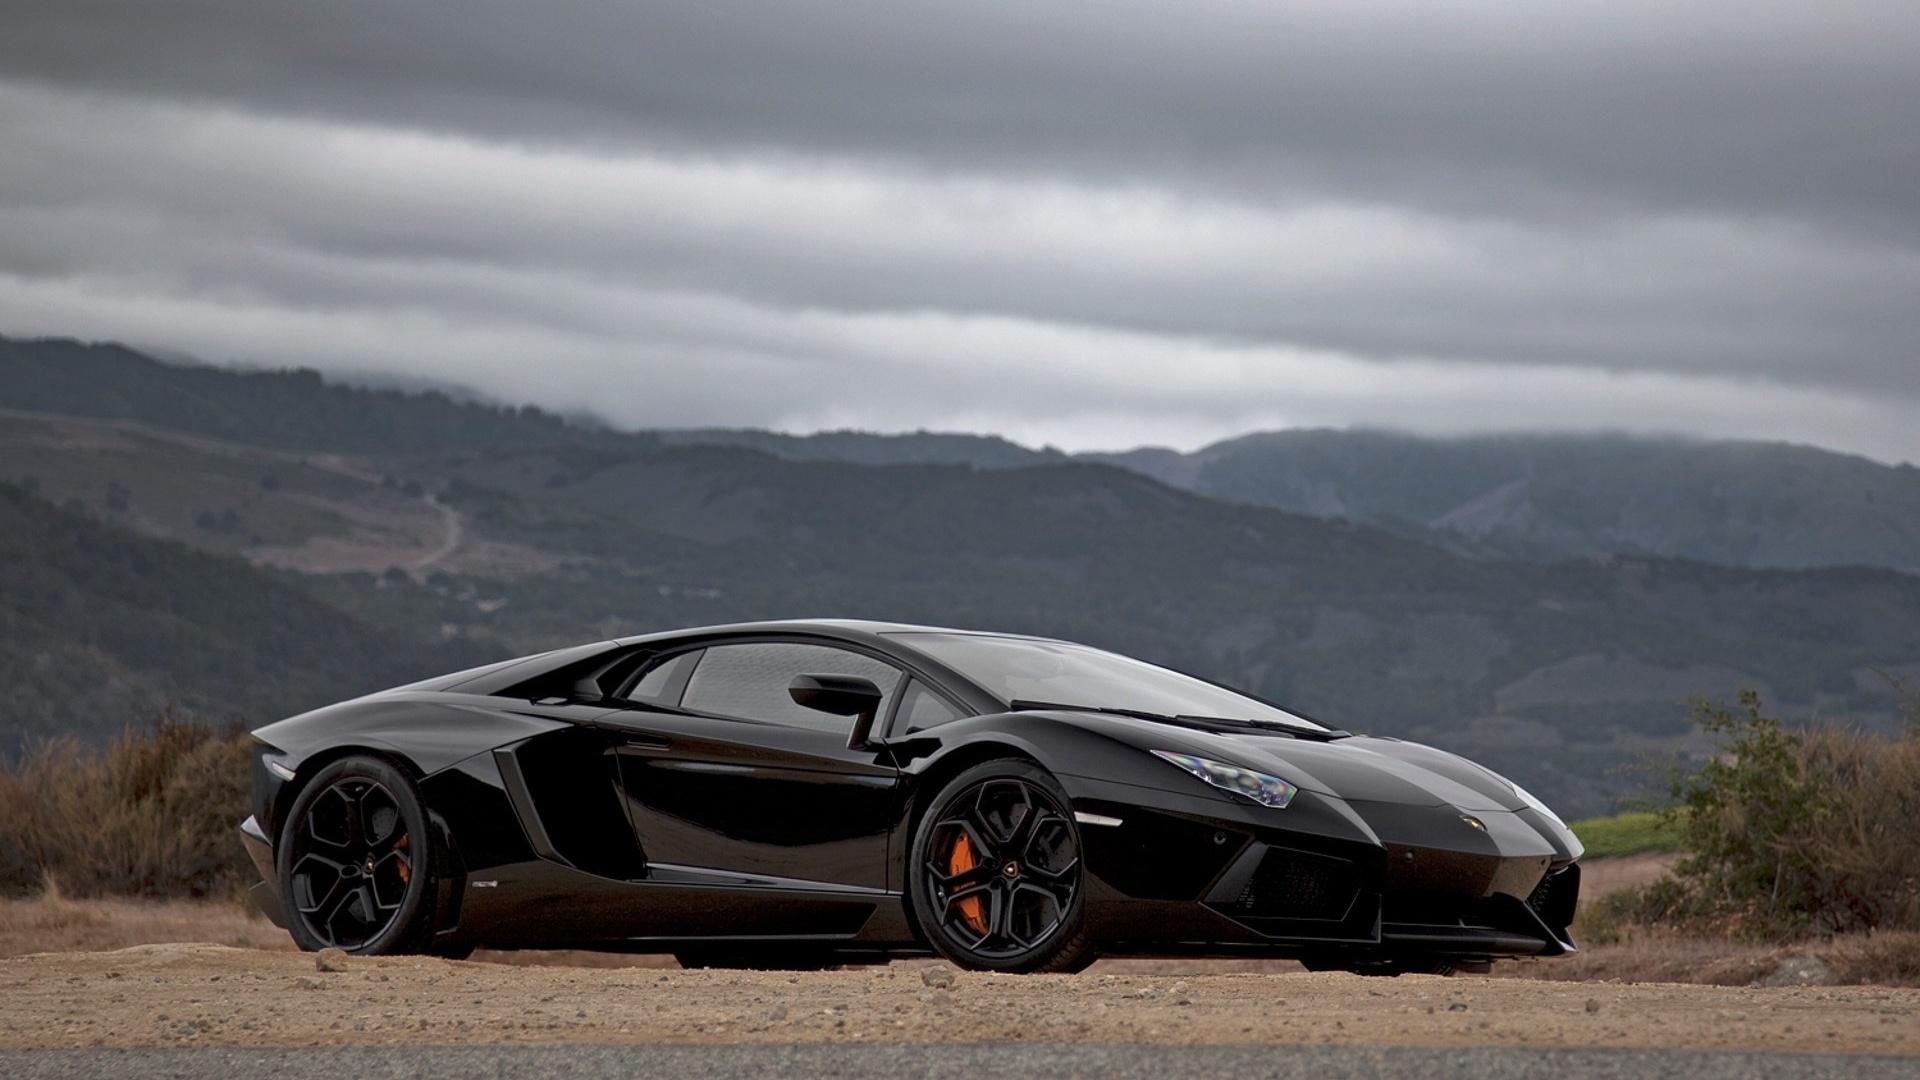 1920x1080px 1080p Lamborghini Wallpaper Wallpapersafari